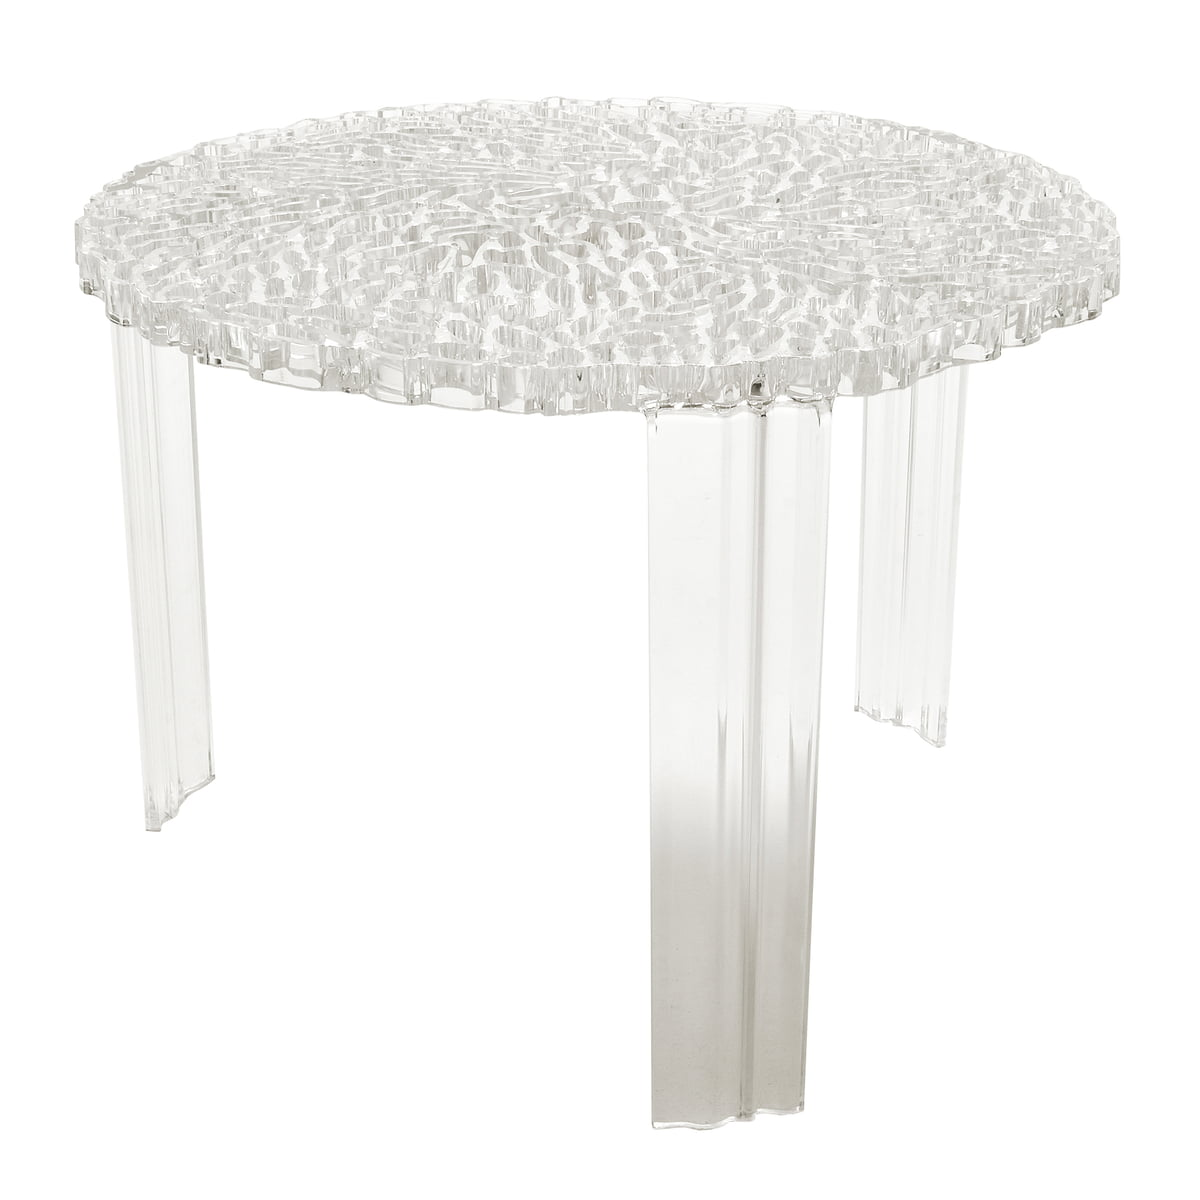 T table kartell shop - Table gigogne plexiglas ...